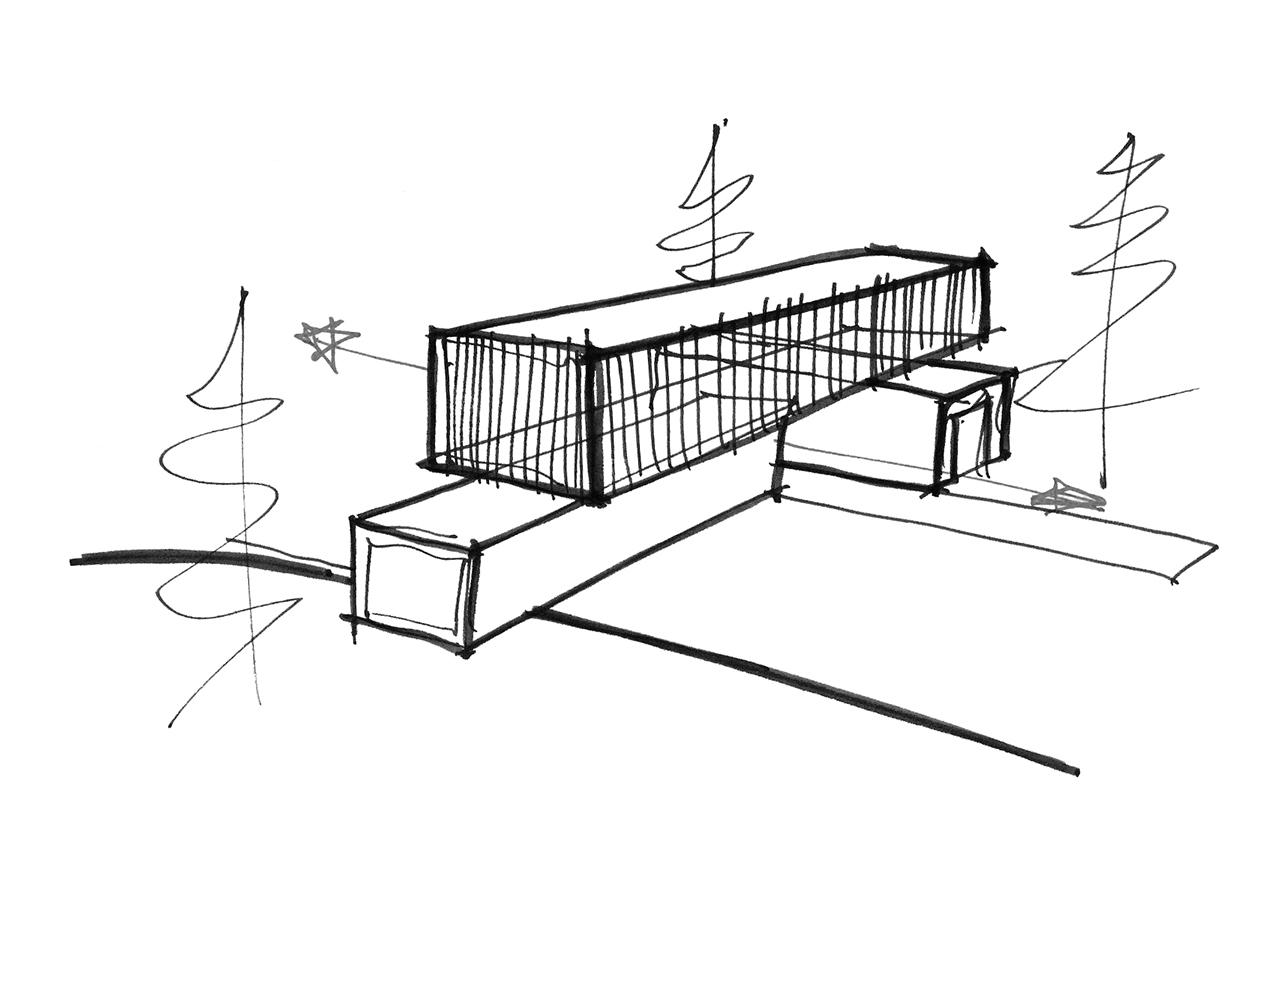 DESKarchitectes_Sketch_12-004.jpg